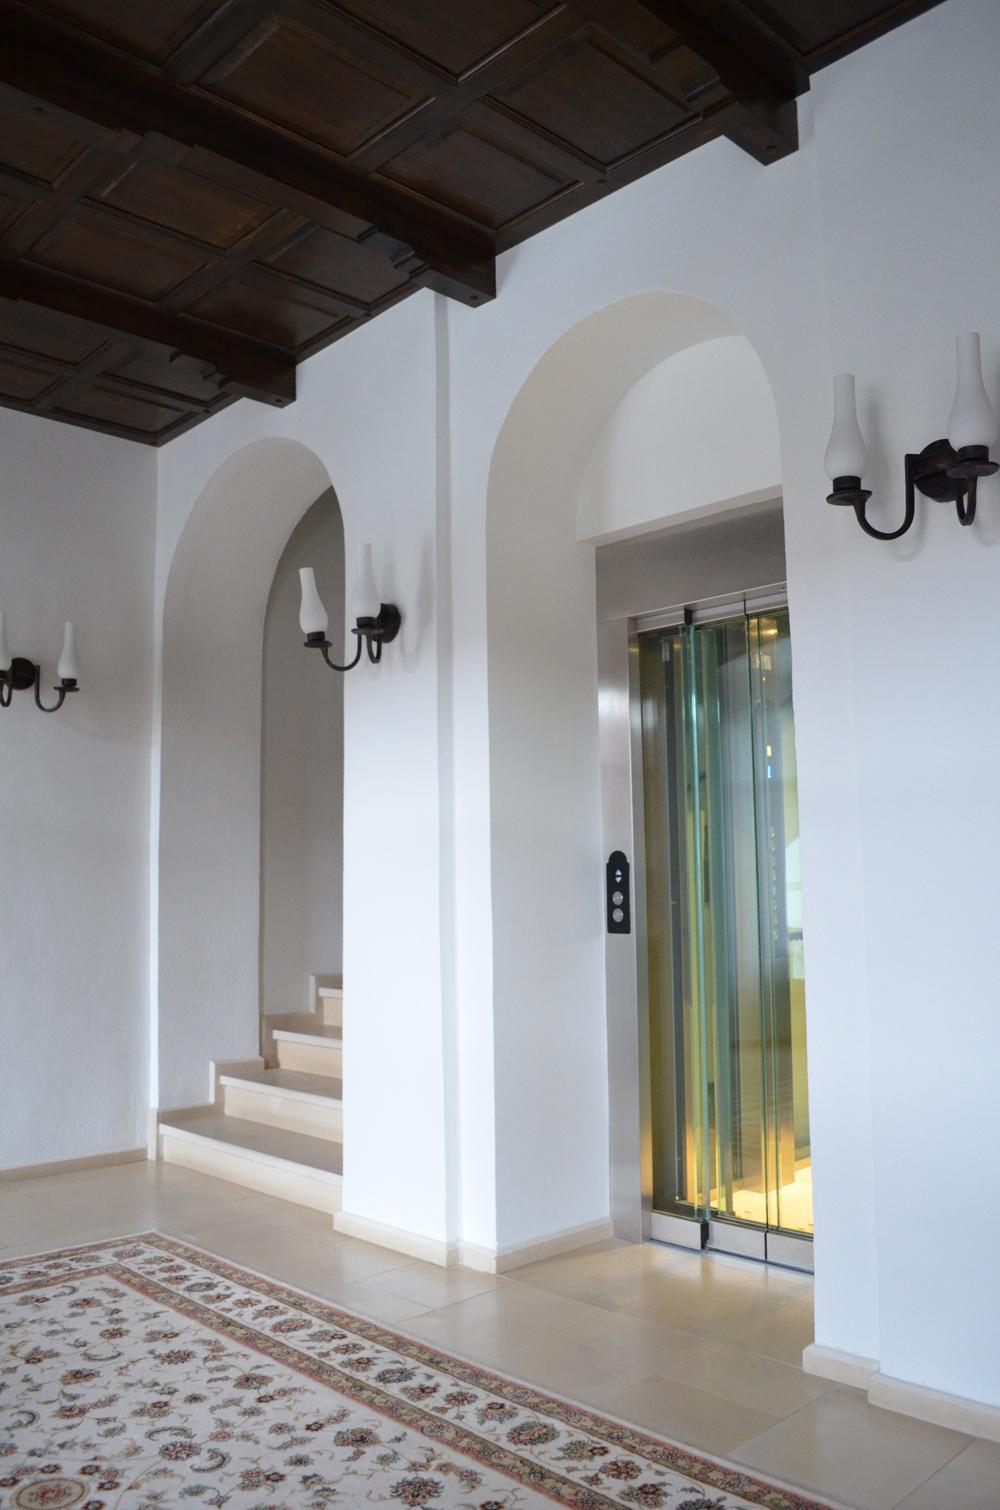 Ascensor panoramic - Hotel ALBA IULIA ELMAS - Poza 2